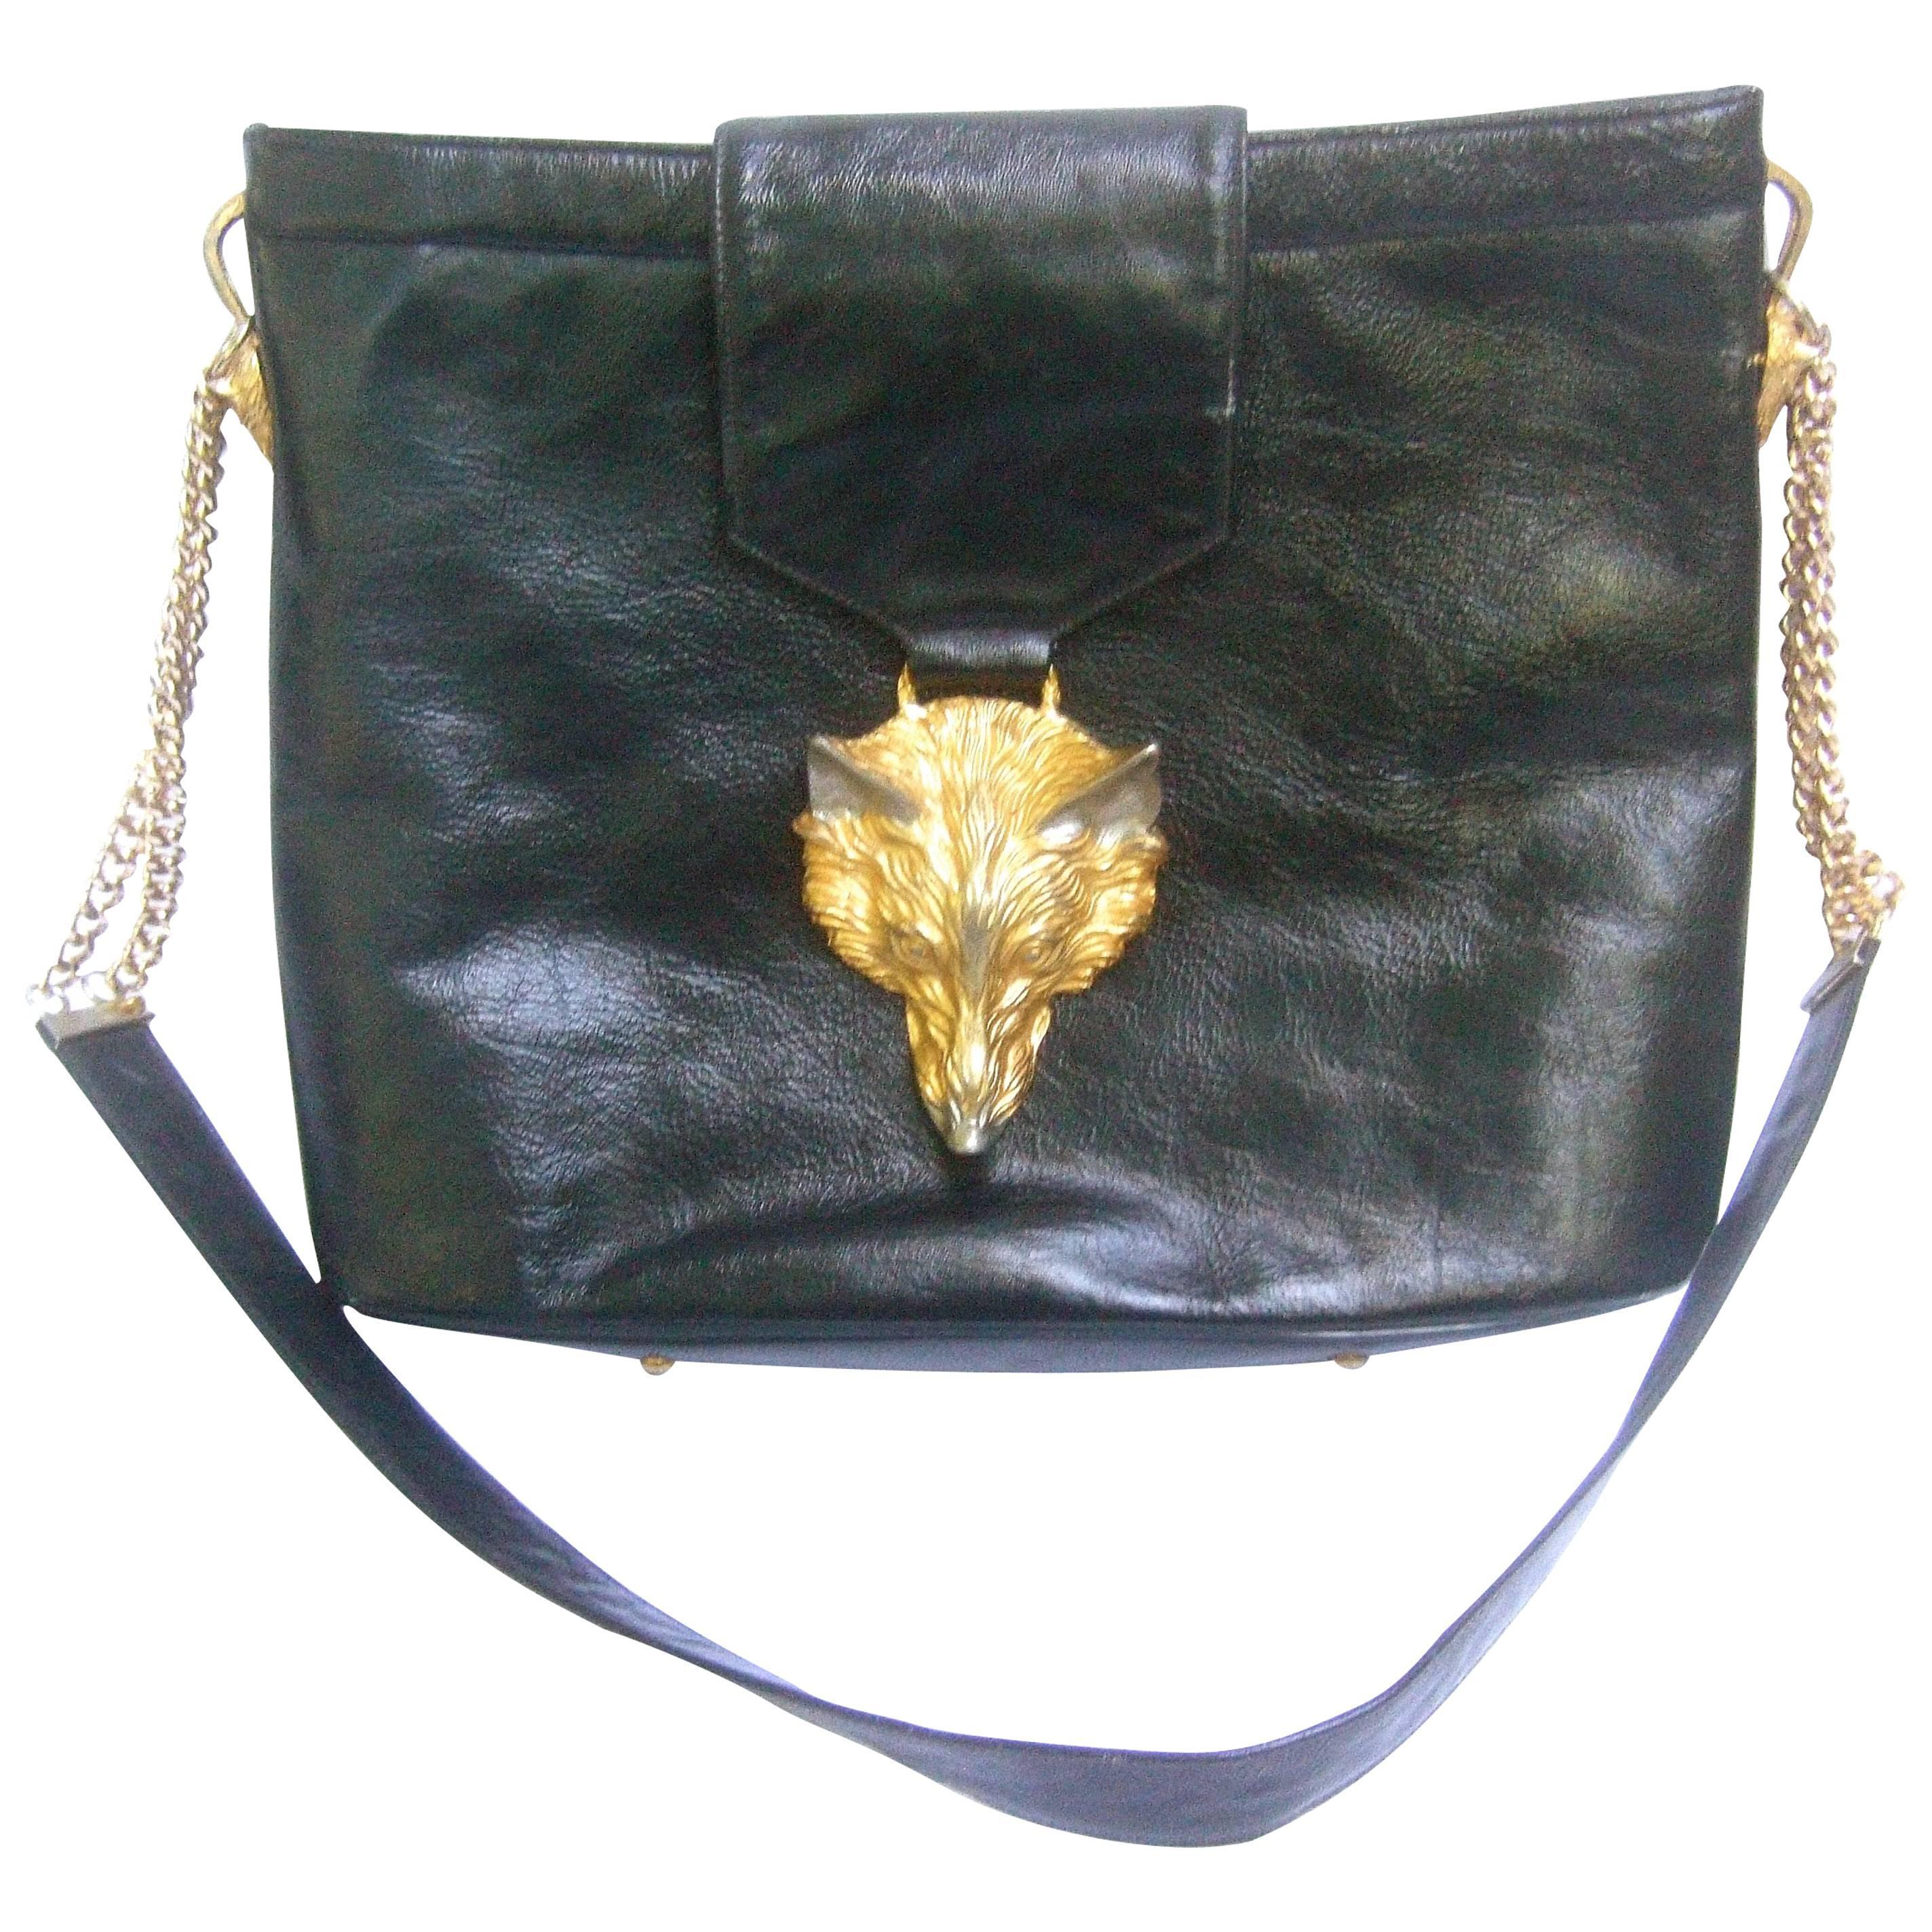 Avant Garde Fox Emblem Black Leather Handbag Designed by Harry Rosenfeld c 1970s